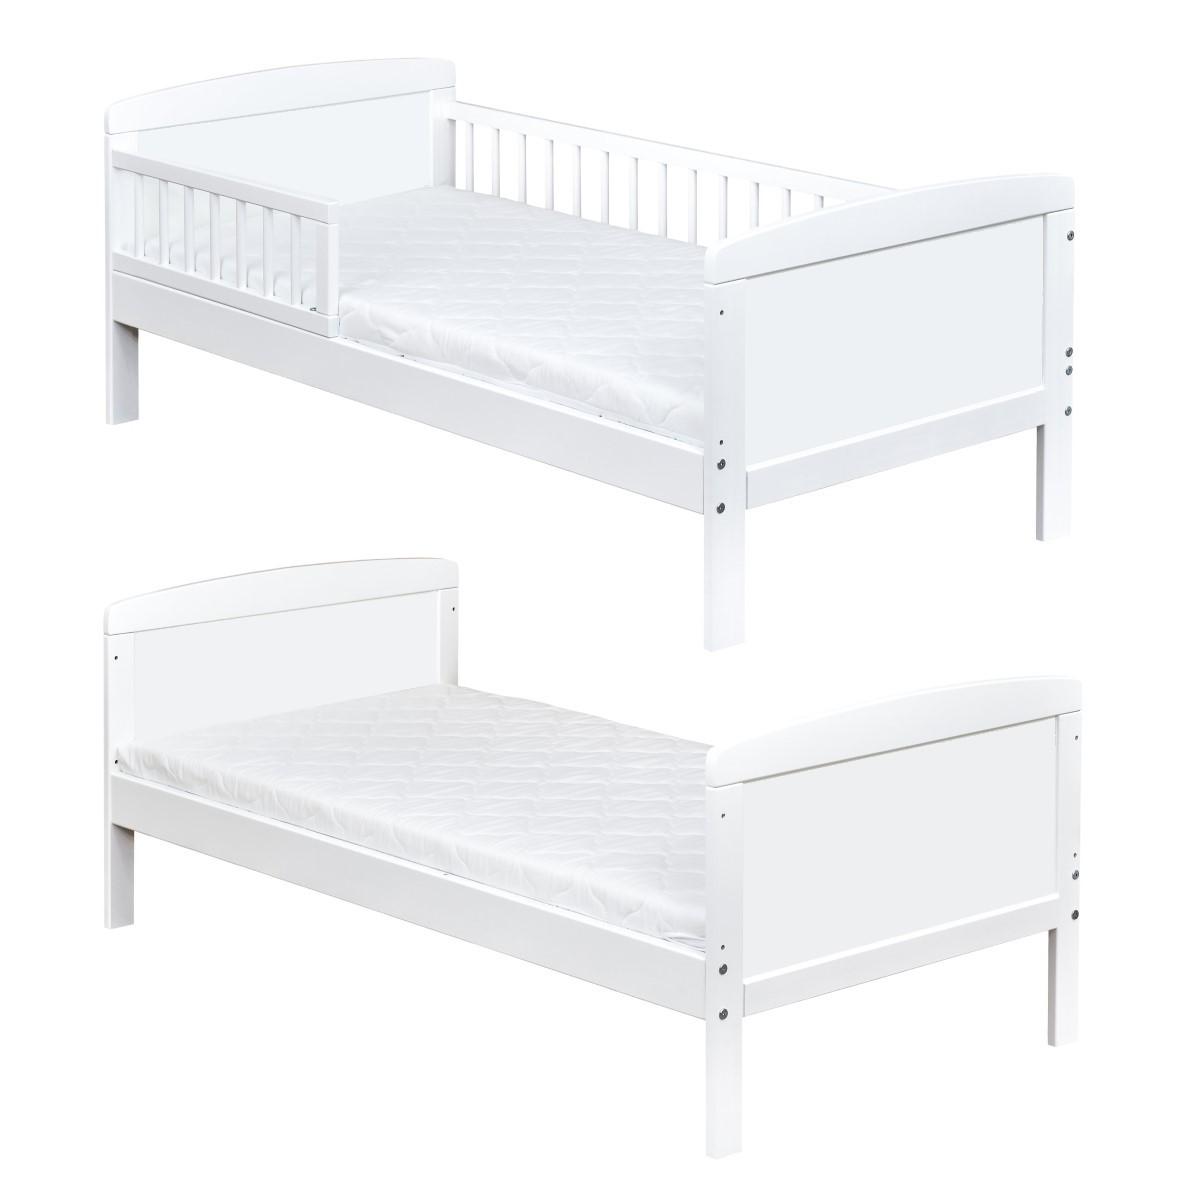 babybett kinderbett gitterbett 2in1 umbaubar 70x140 massivholz neu ebay. Black Bedroom Furniture Sets. Home Design Ideas